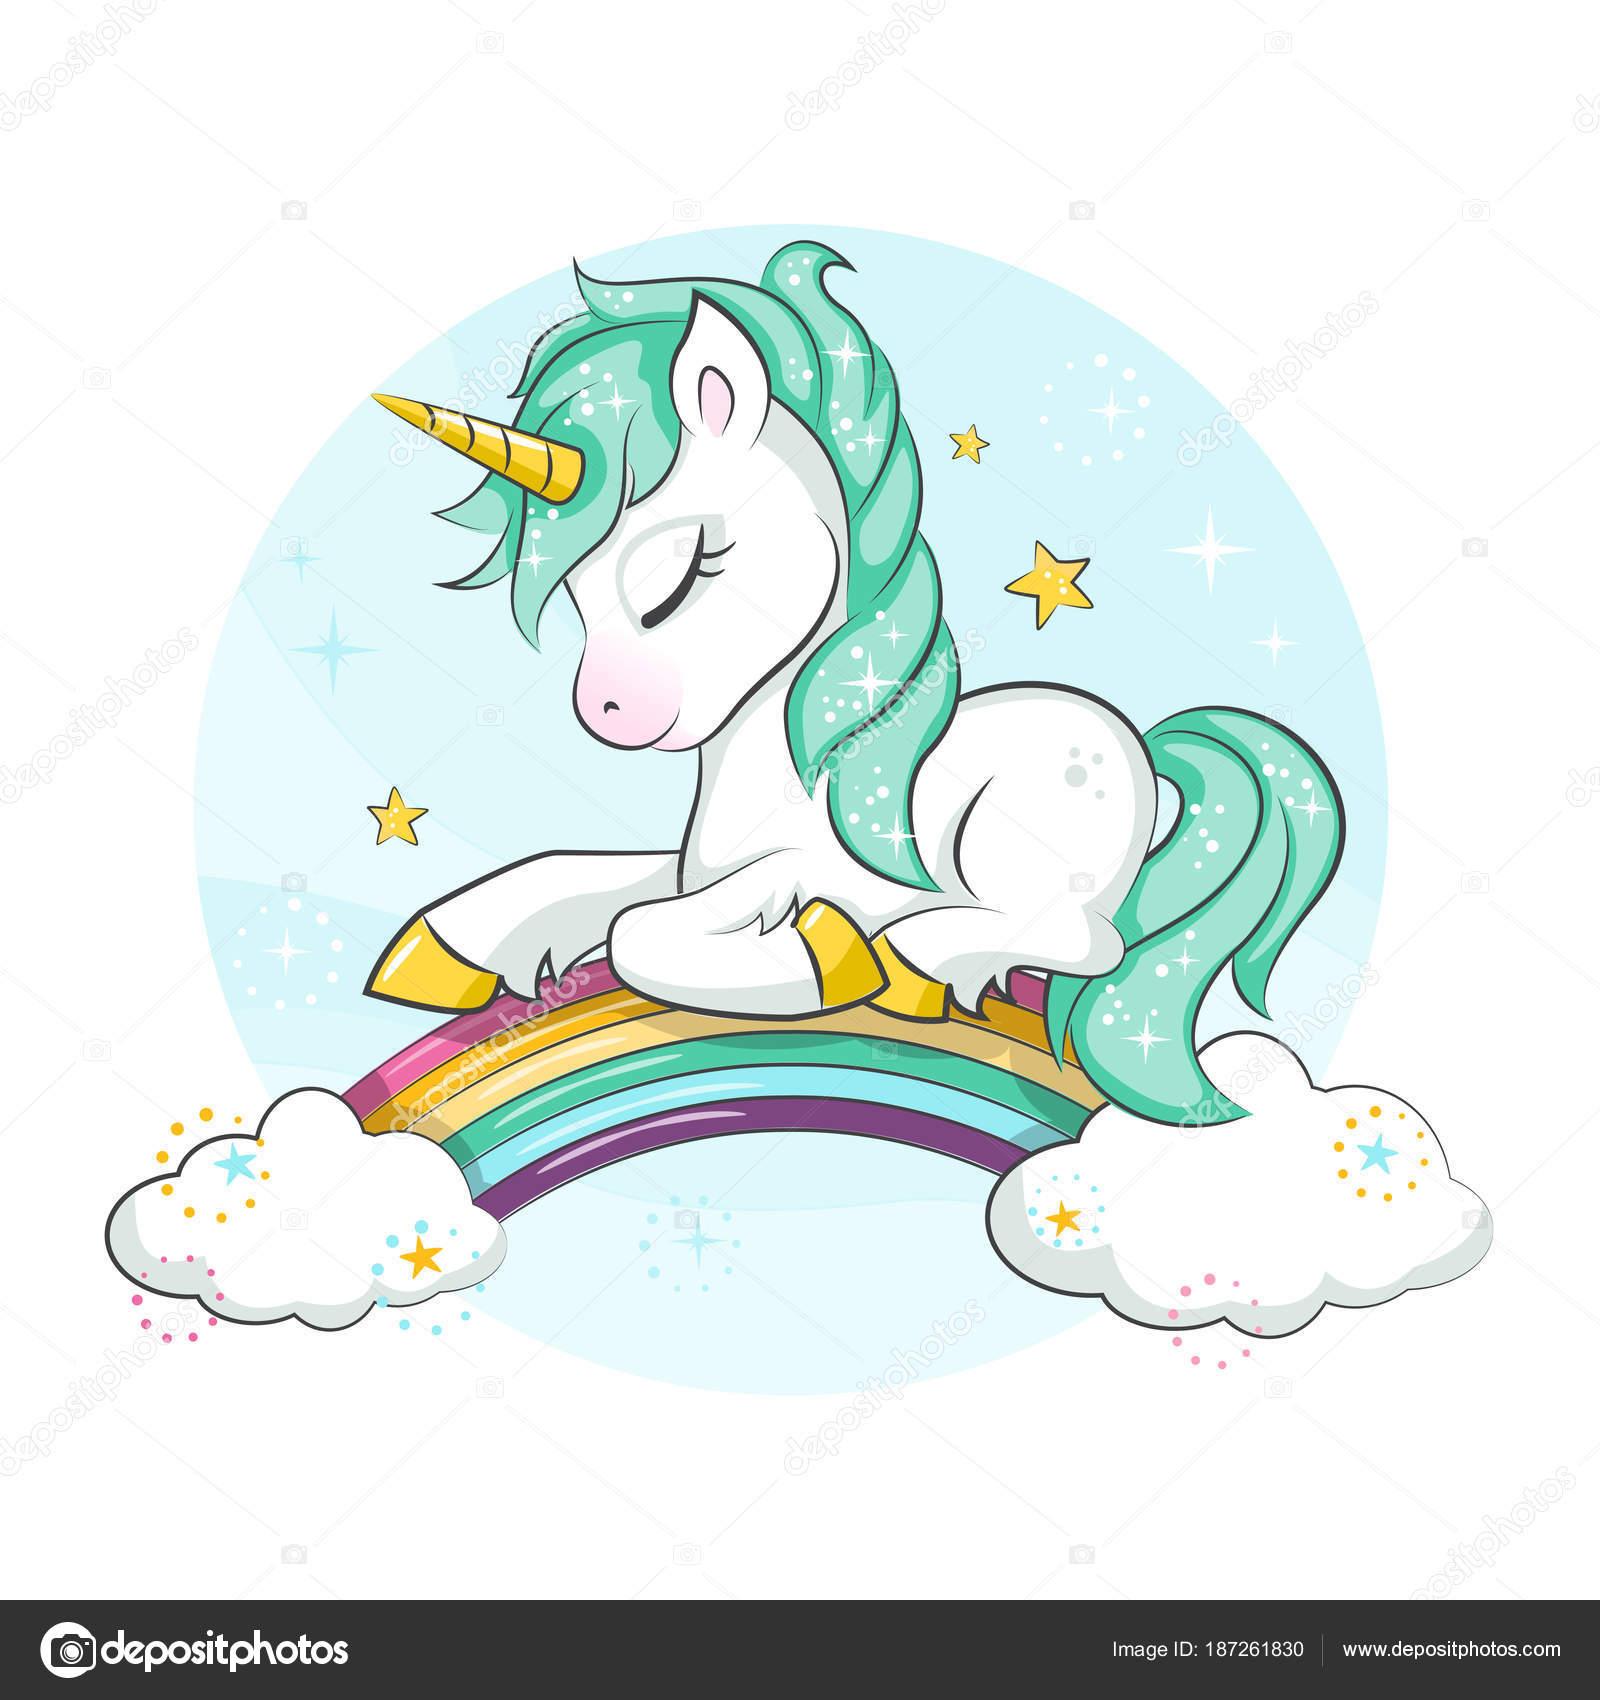 Pequeño Pony Lindo Unicornio Mágico Arco Iris Diseño Vectores ...